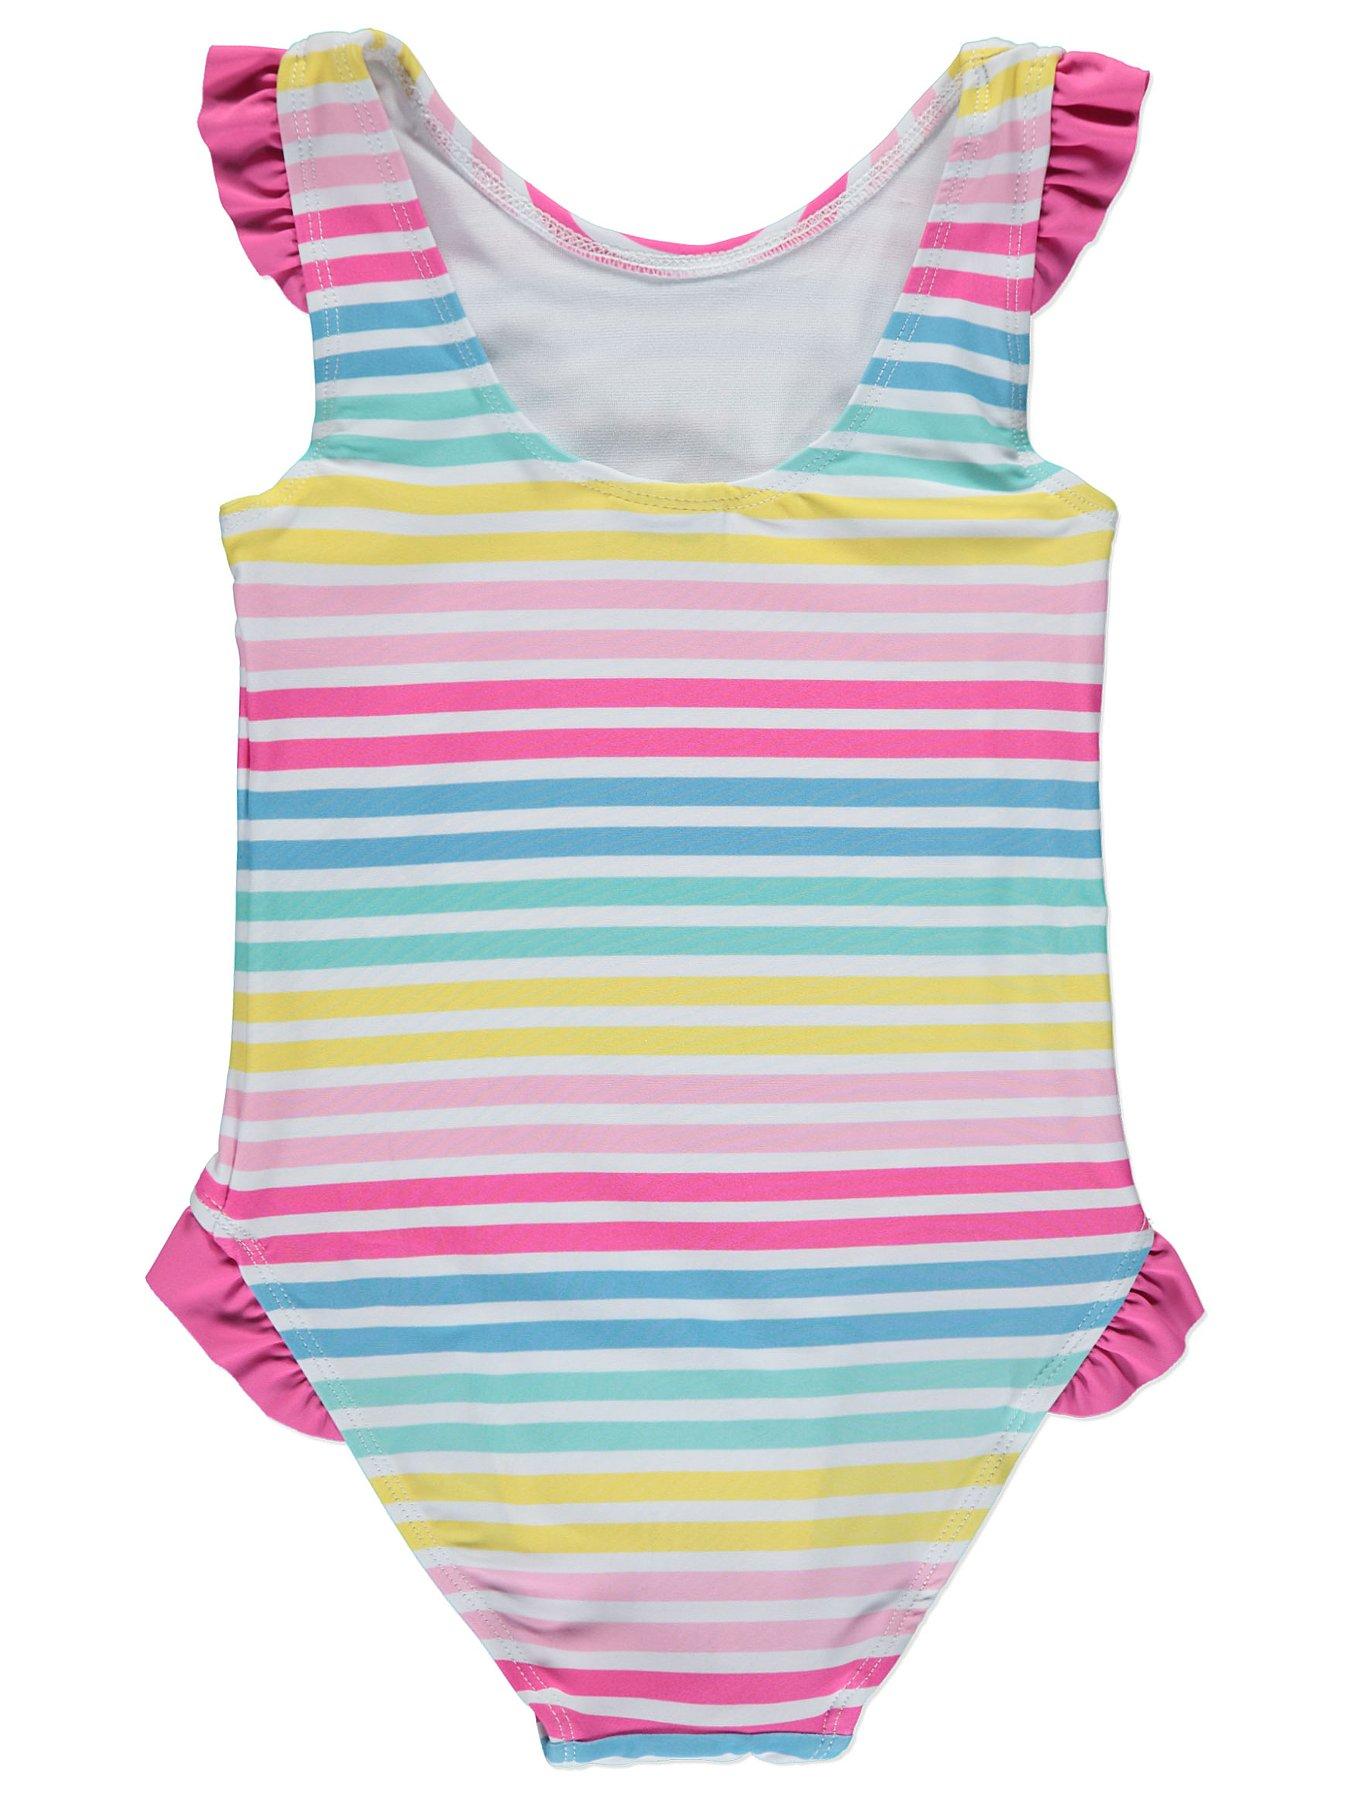 Peppa Pig Striped Swimsuit. Reset da228edaf